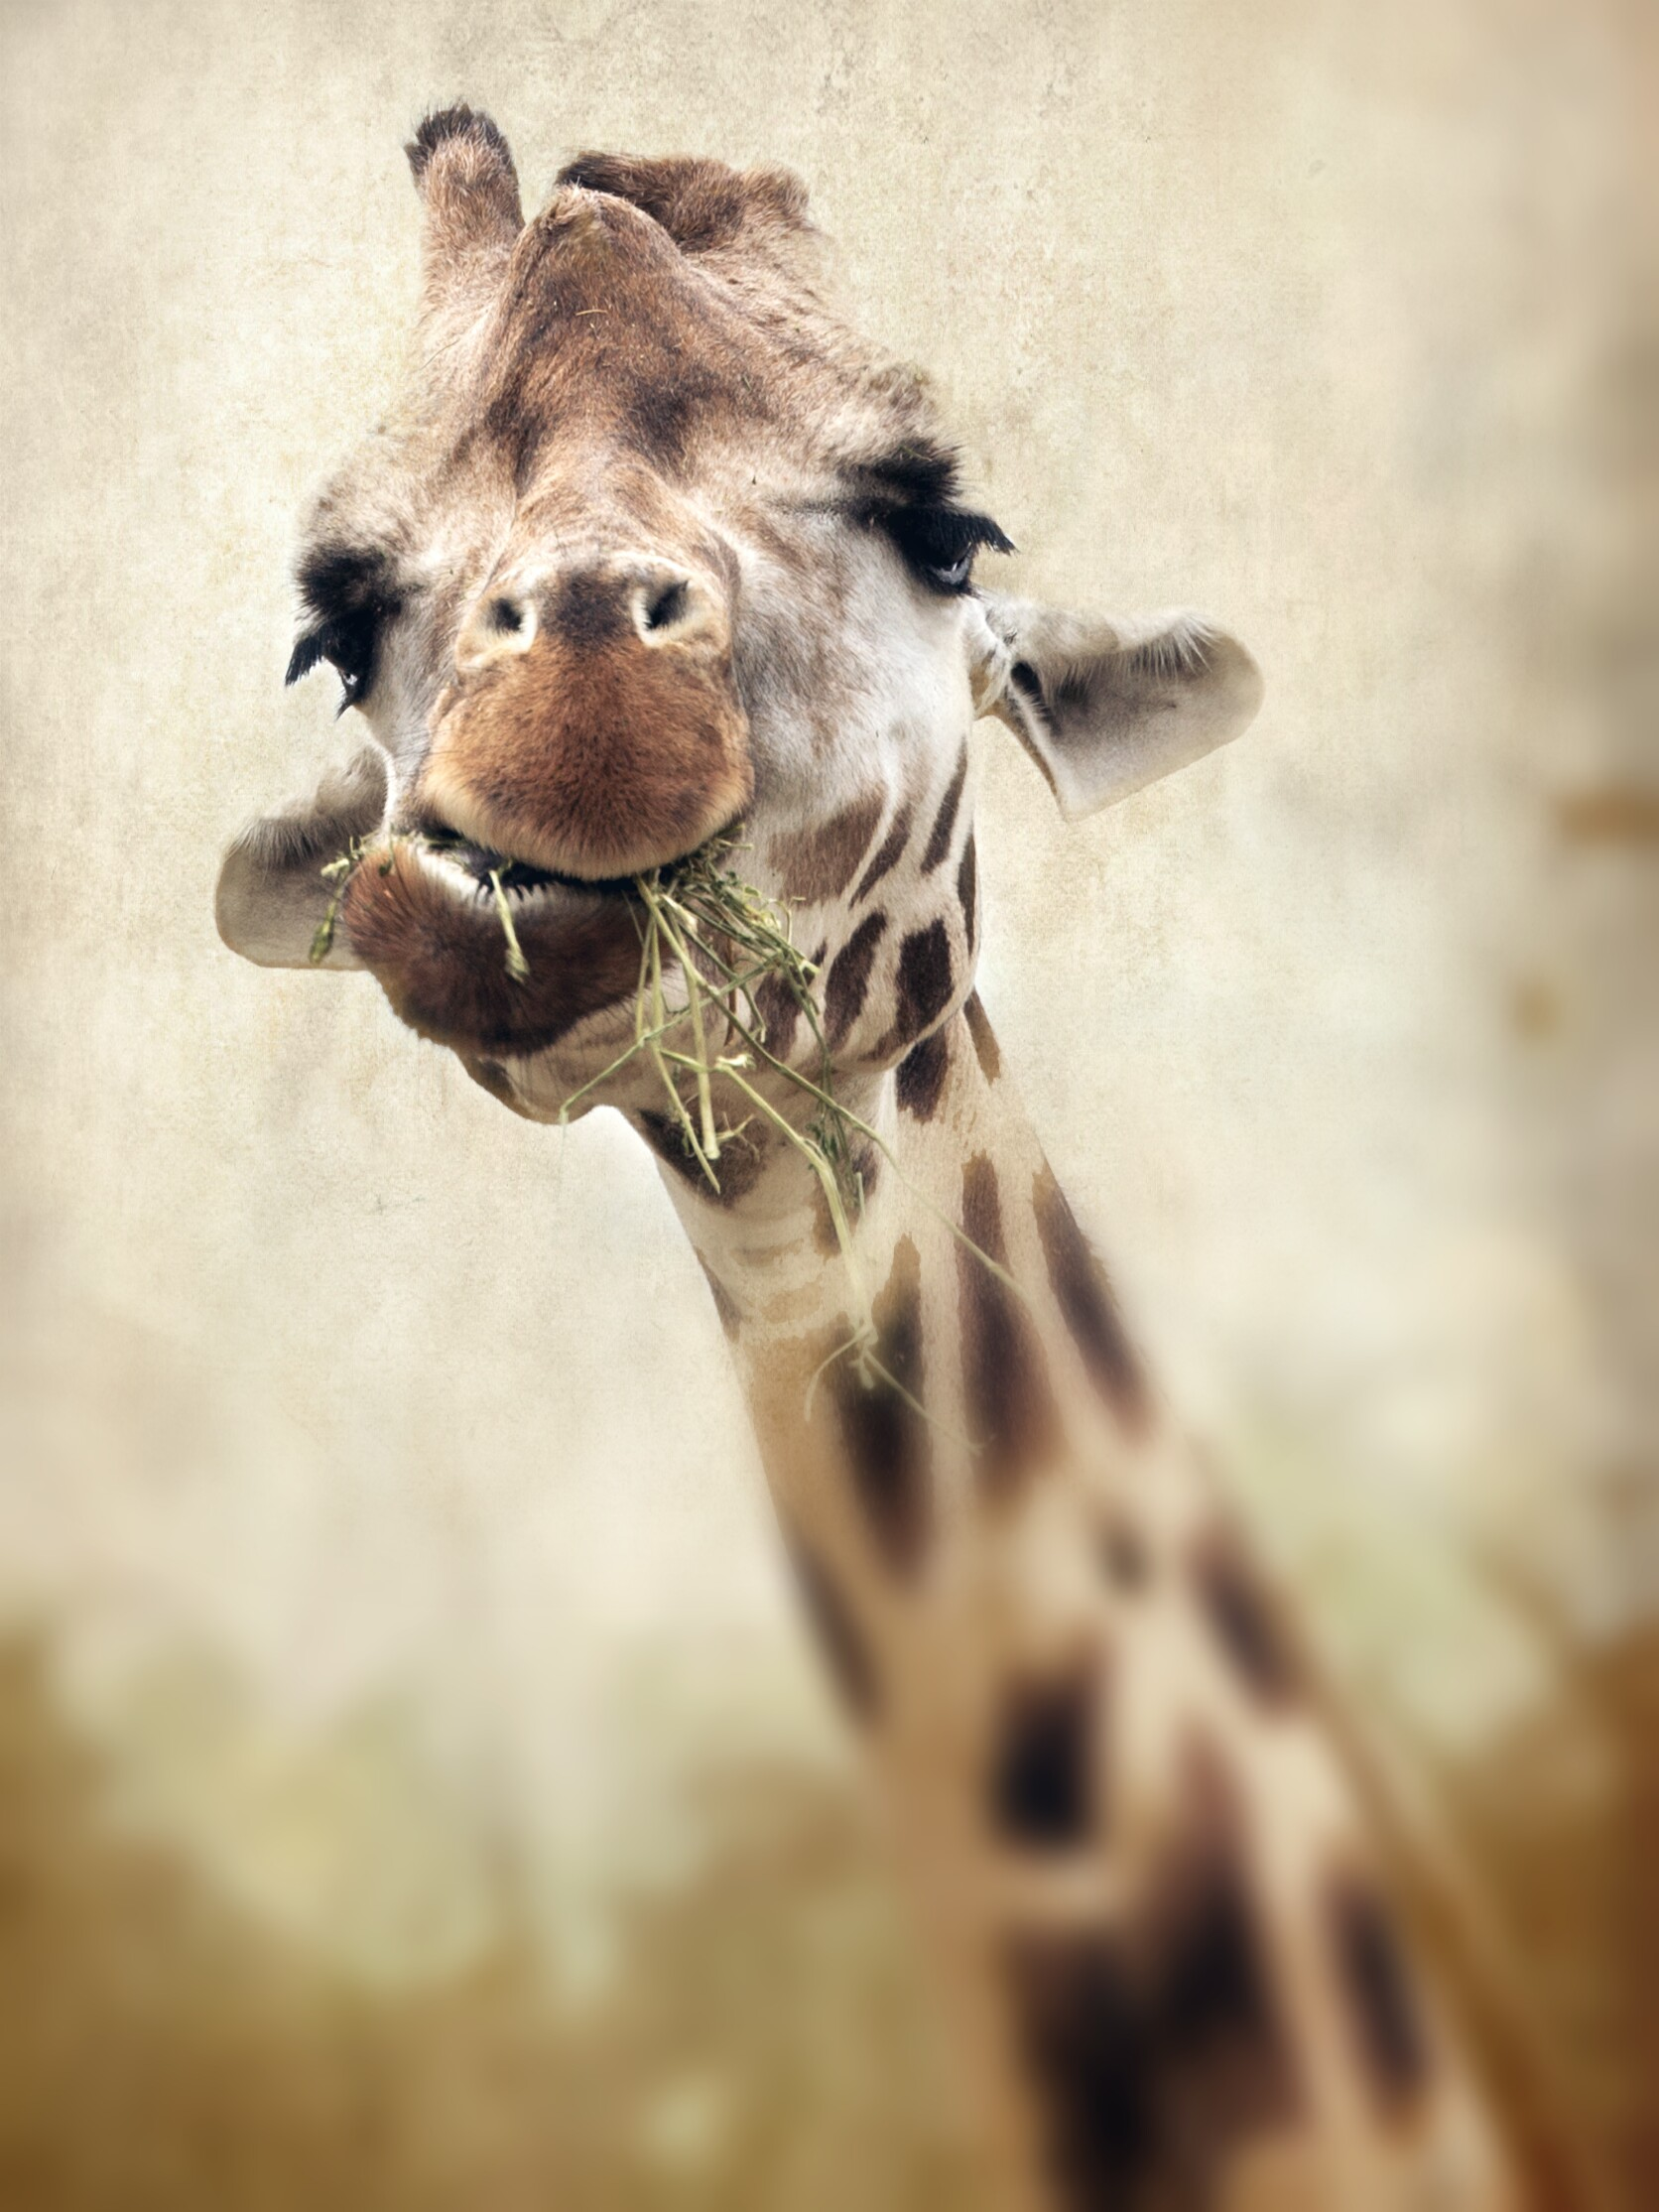 eating giraffe photo